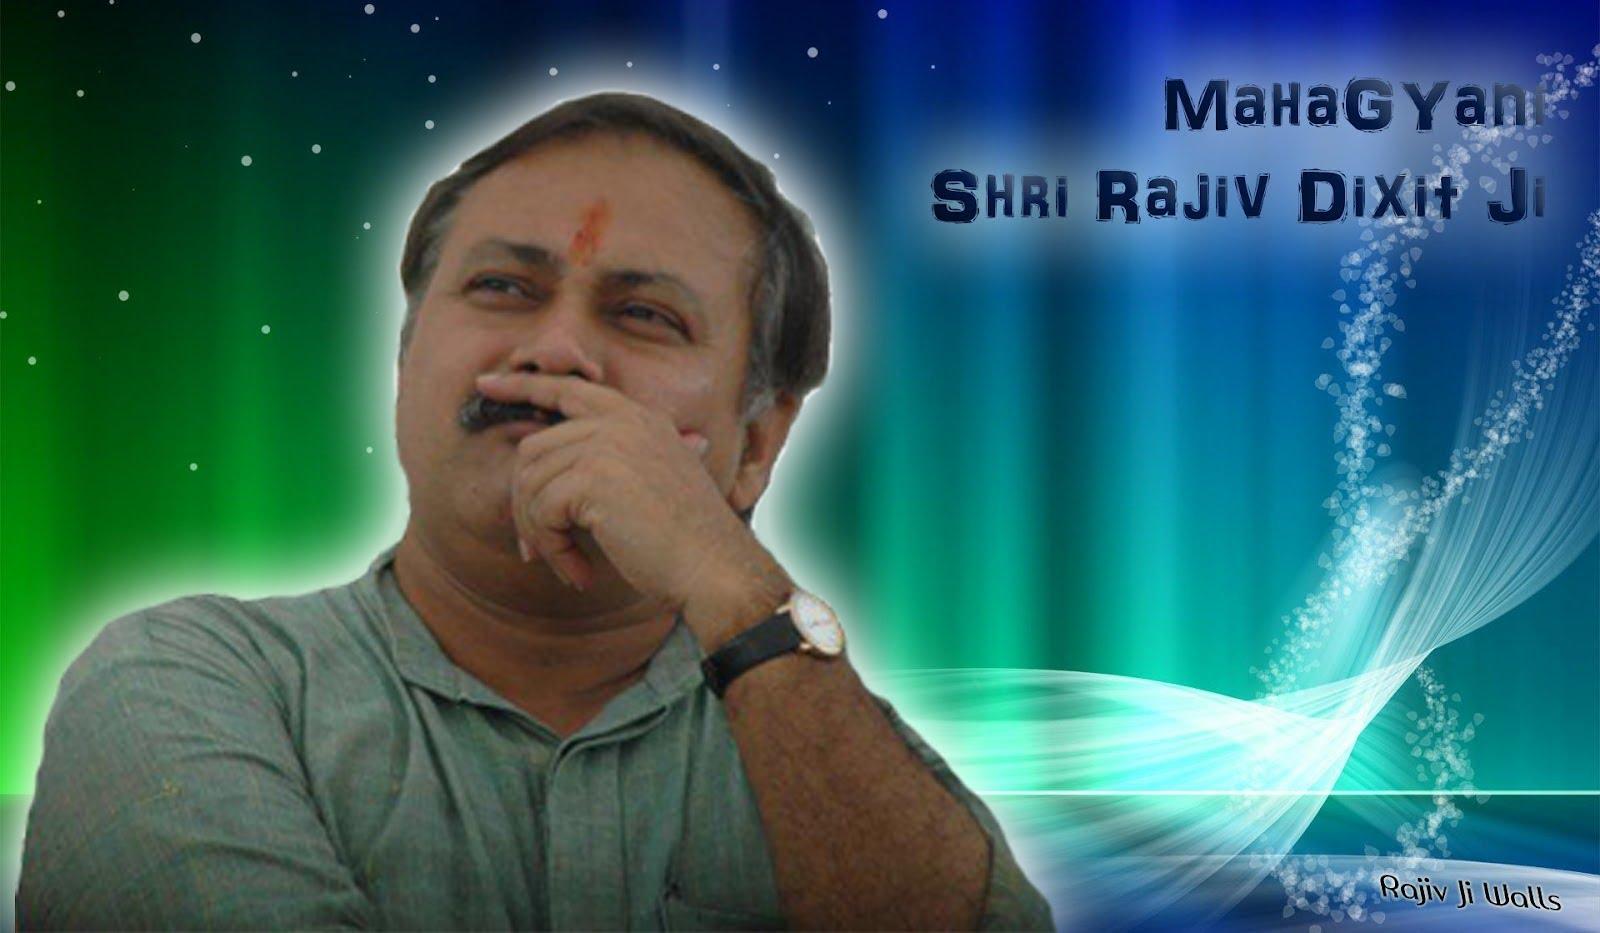 Rajesh 3d Name Wallpaper Download Rajiv Dixit Tapete Seite 3 Von 3 Downloadwallpaper Org